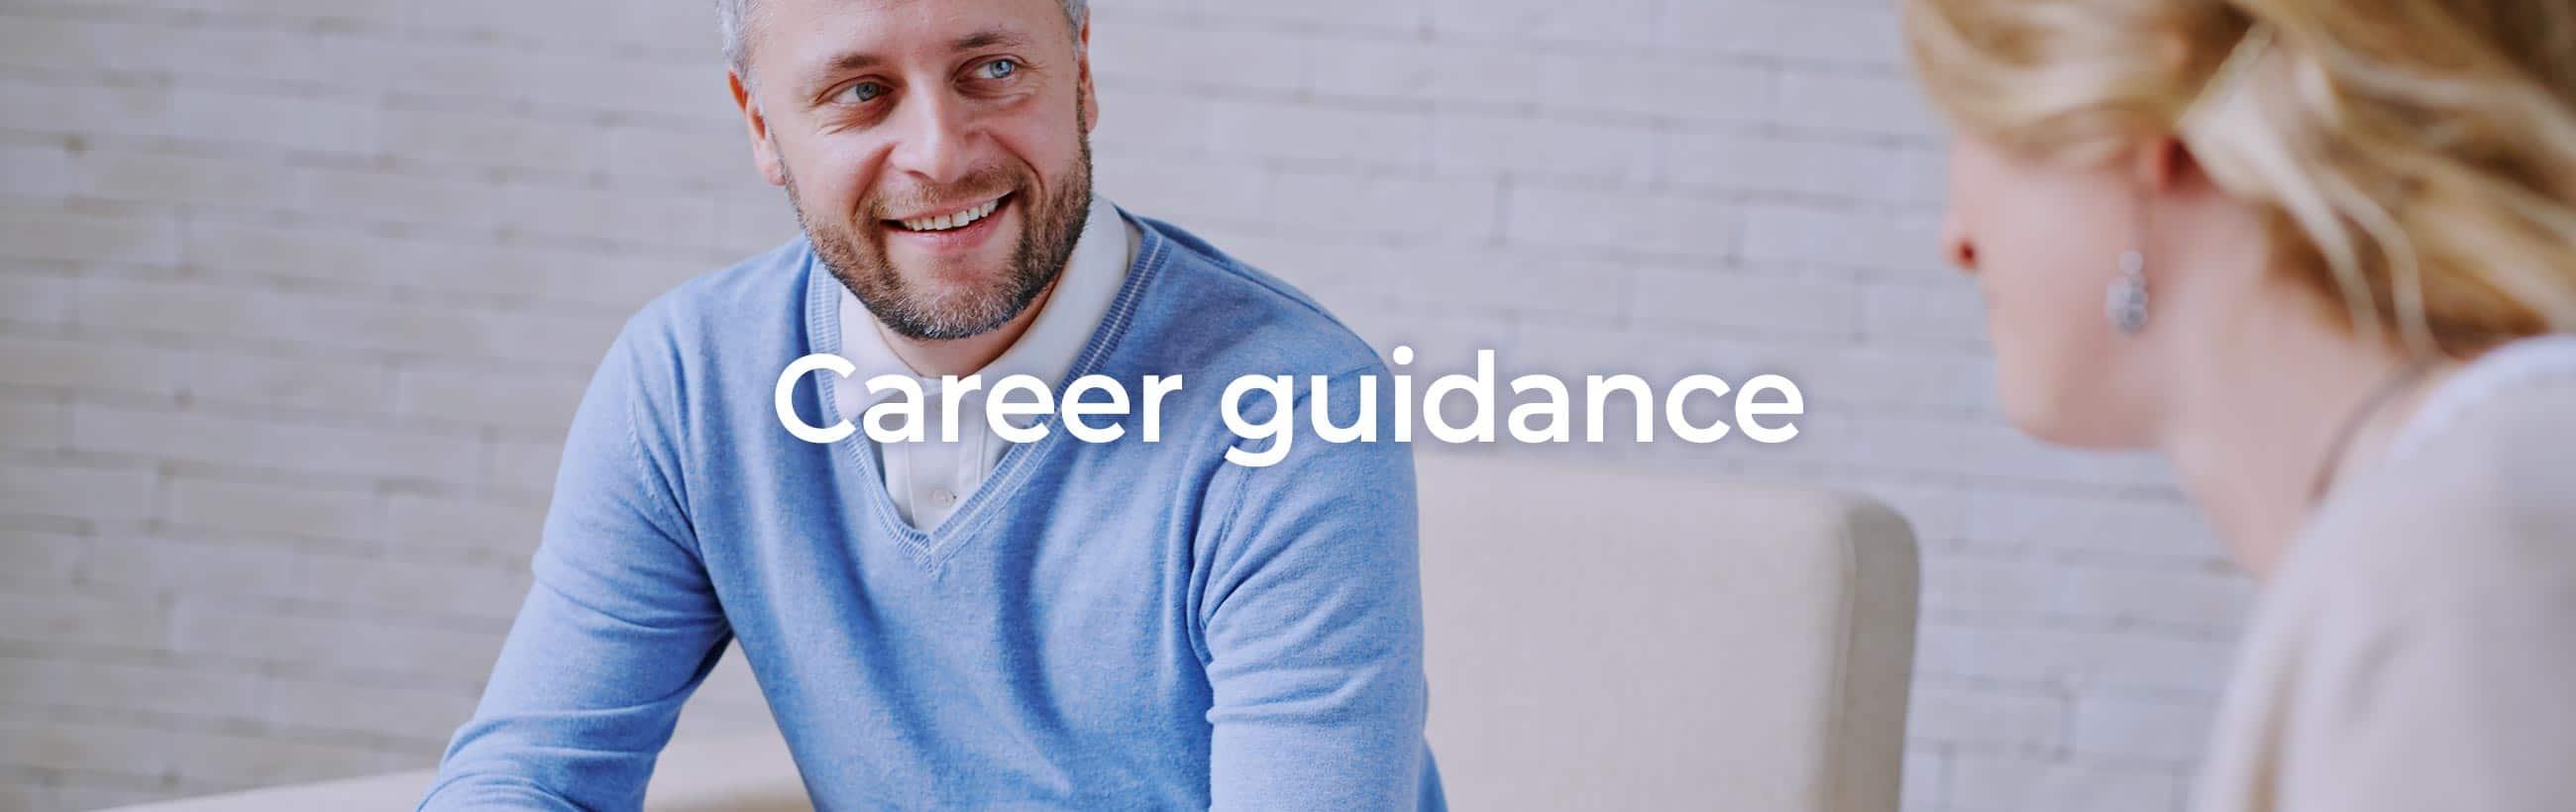 Blueberry Hill - Career guidance